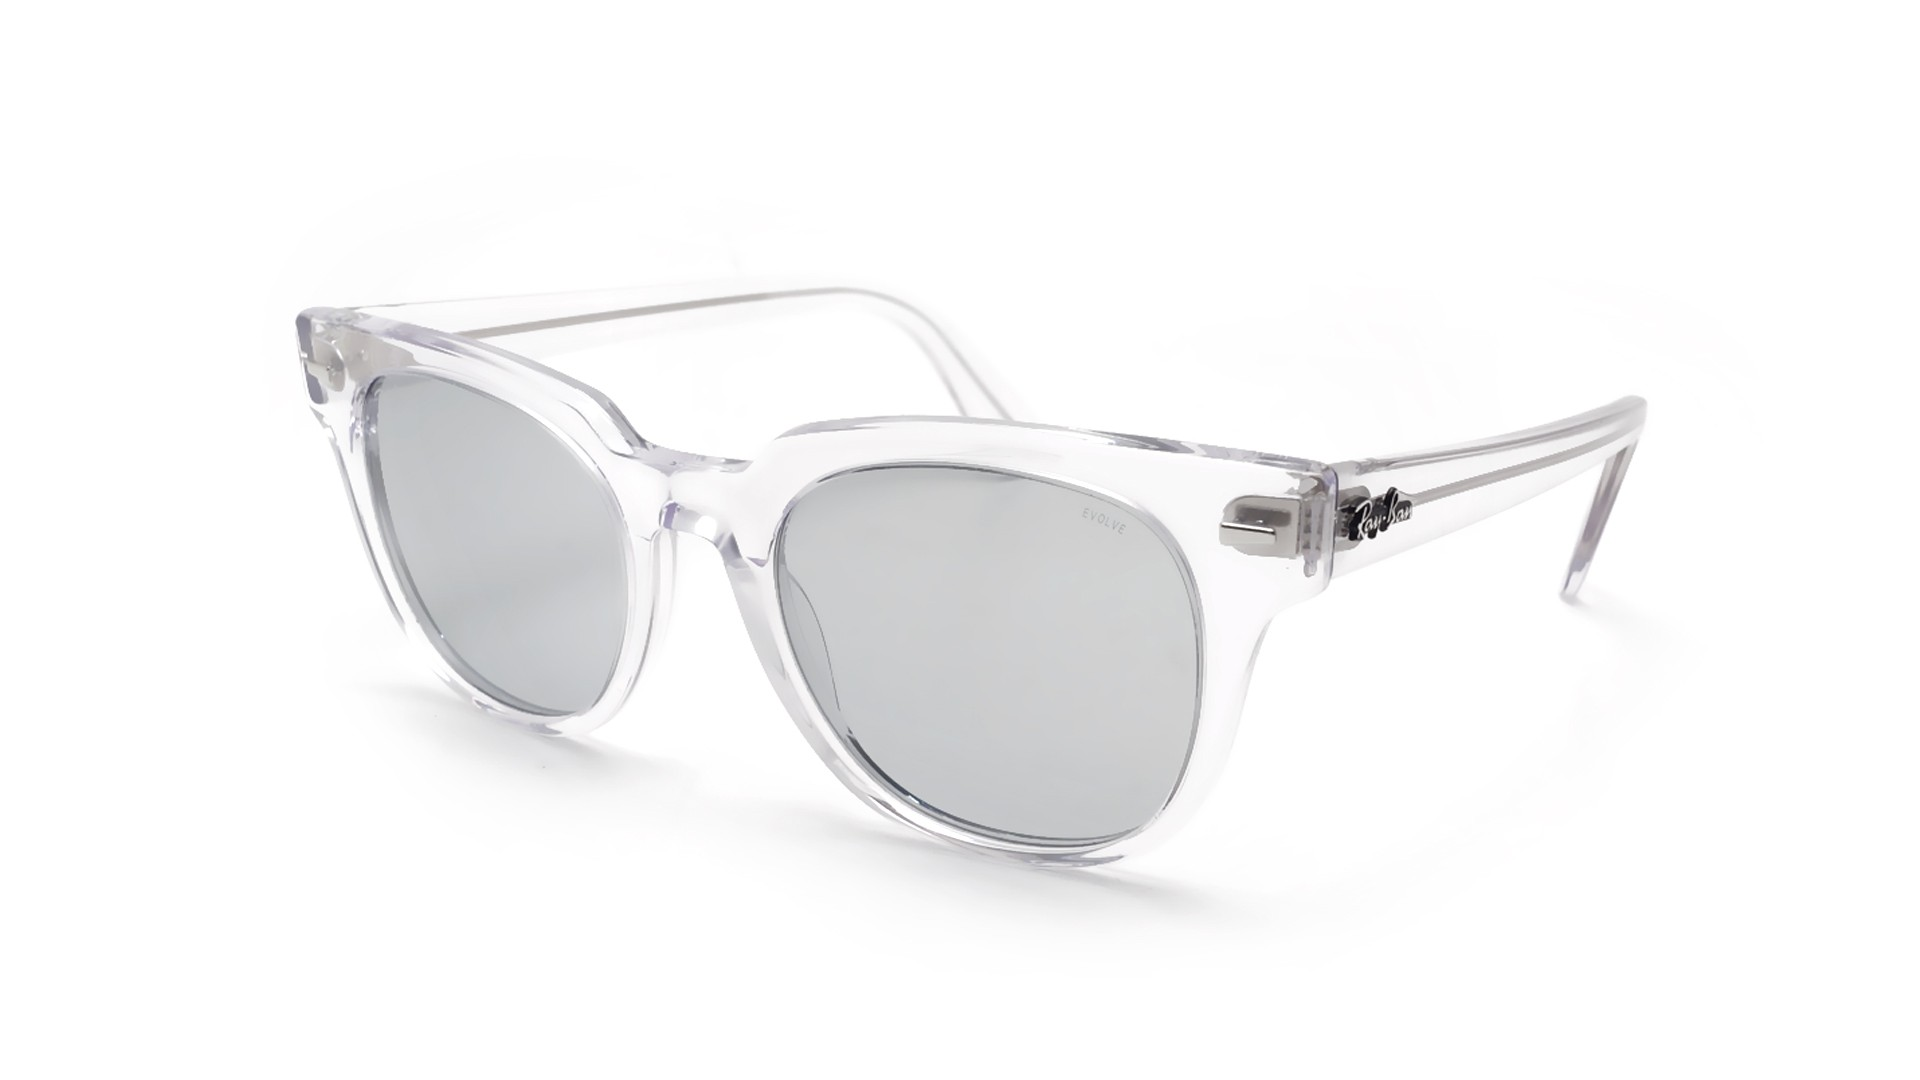 a2f55c9ea6 ... cheapest sunglasses ray ban meteor clear rb2168 912 i5 50 20 medium  photochromic 3e4d6 95ba0